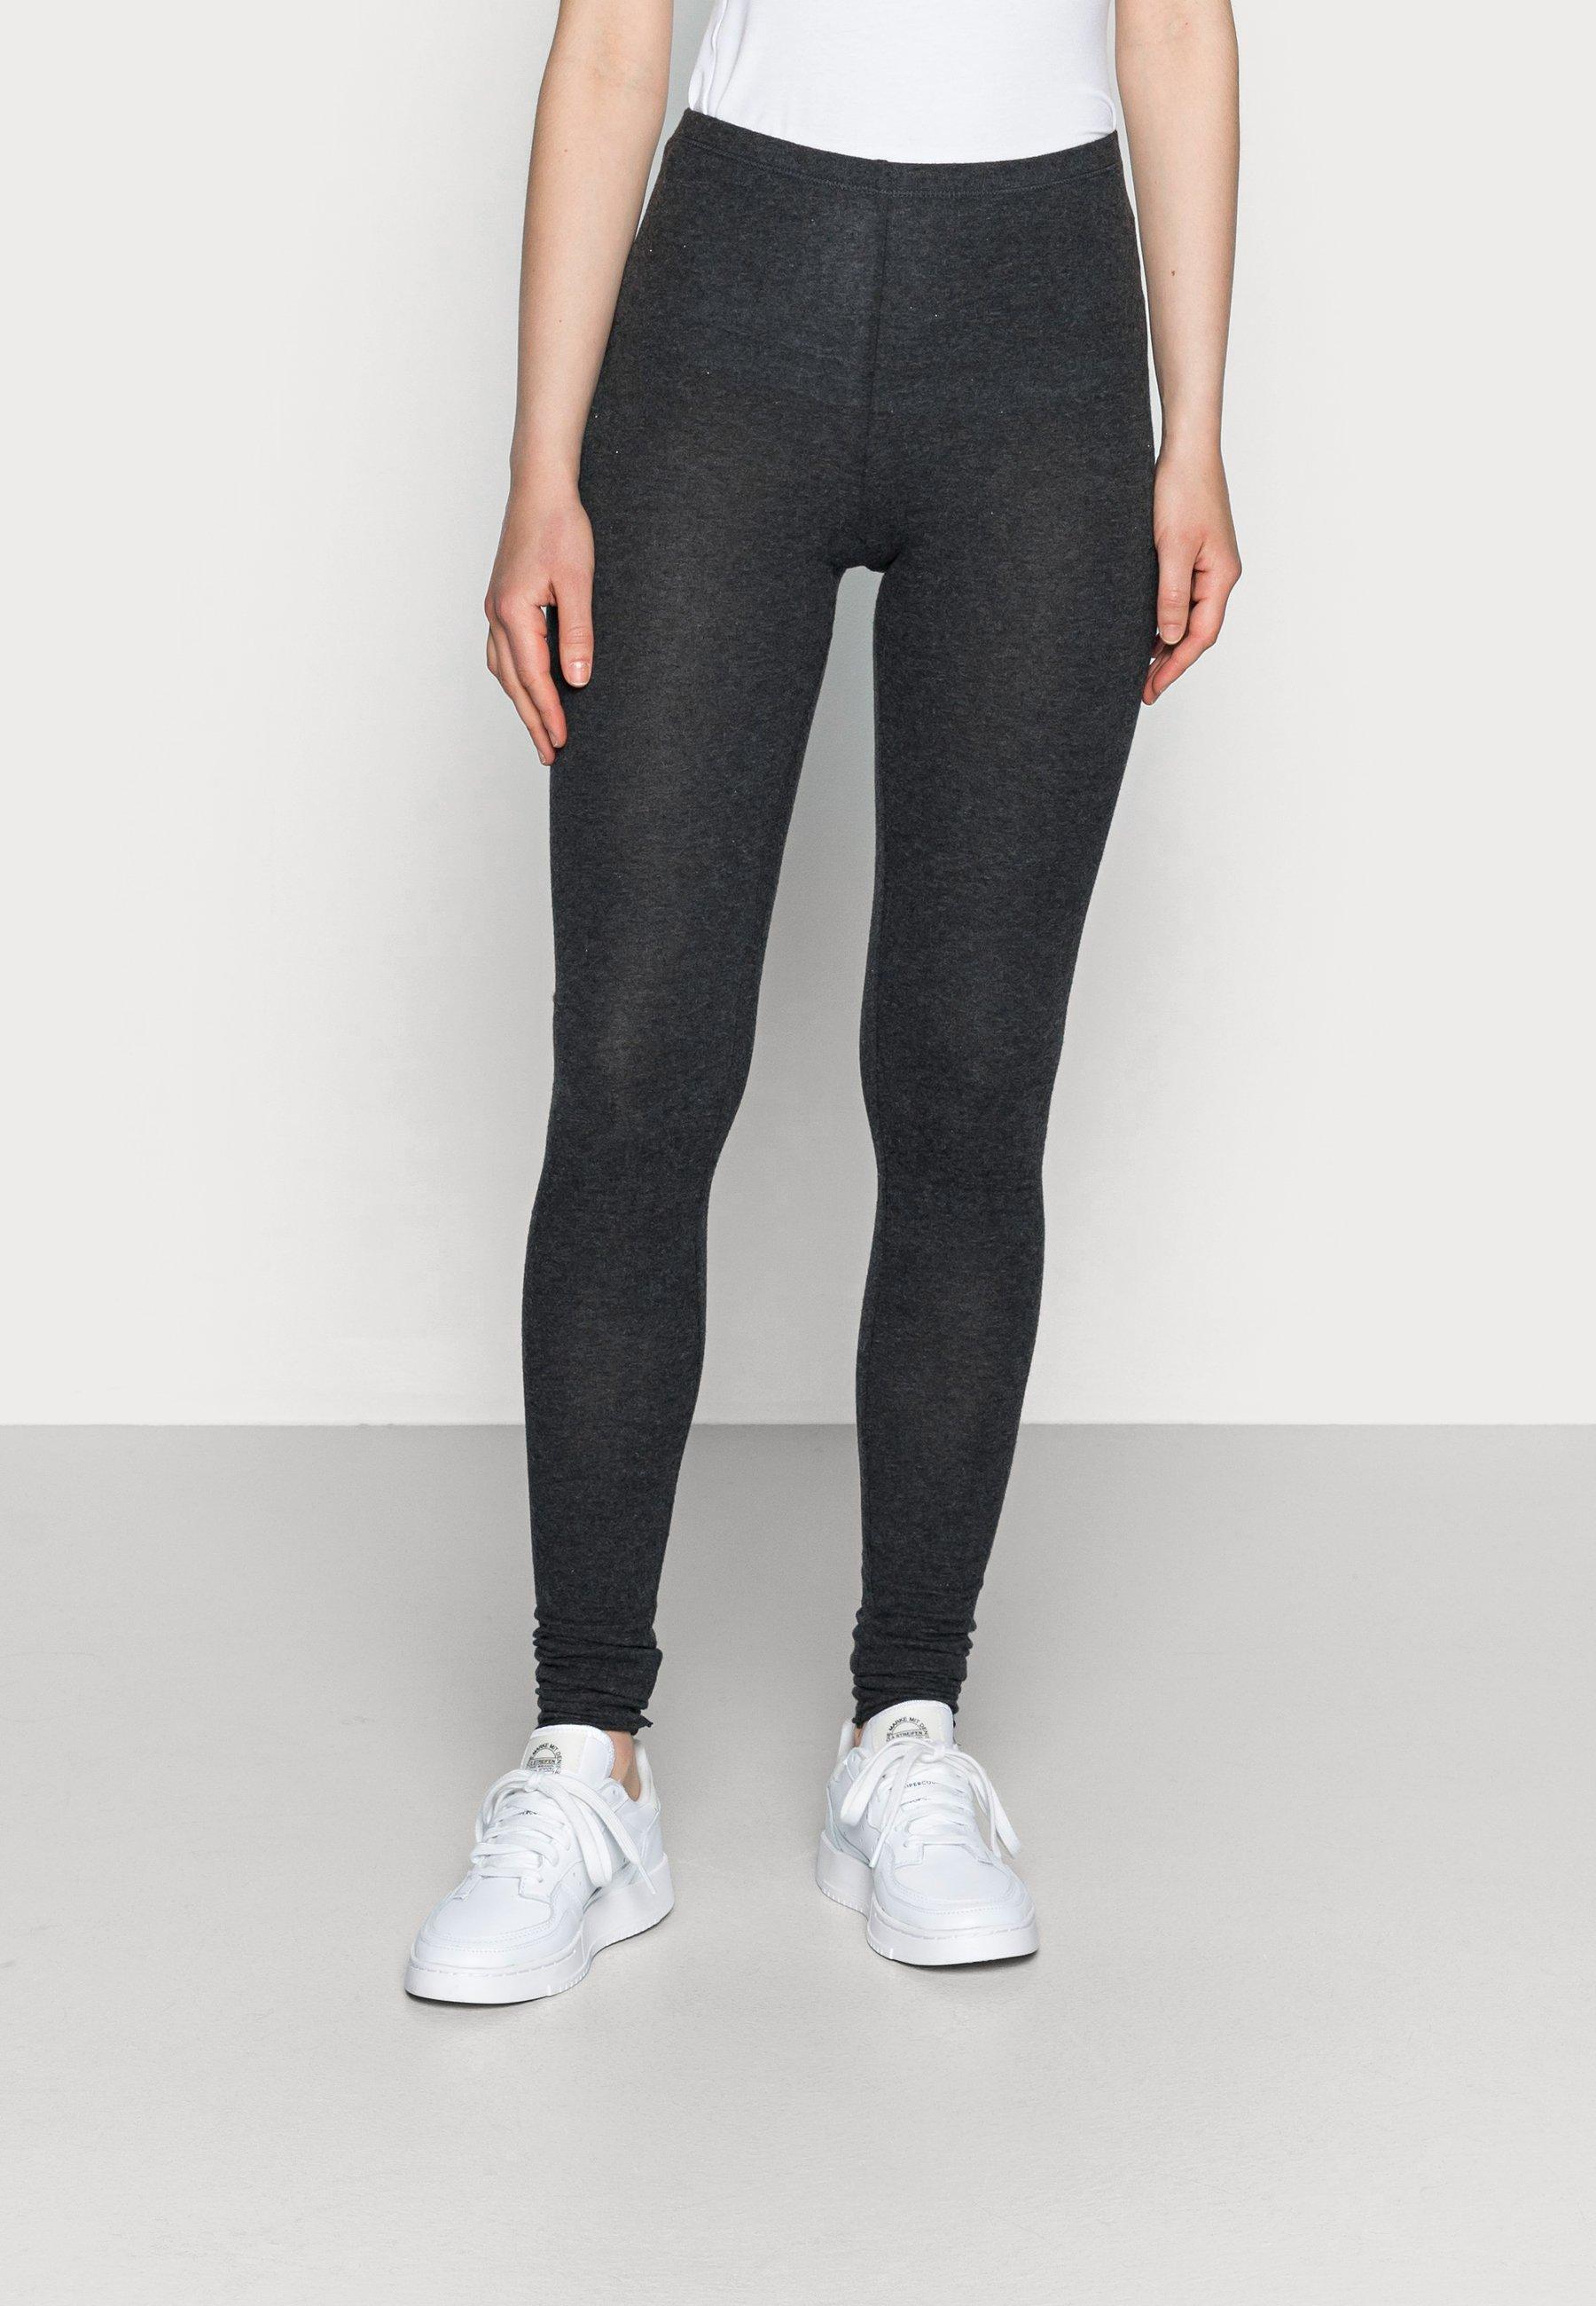 Damen PIPOUN - Leggings - Hosen